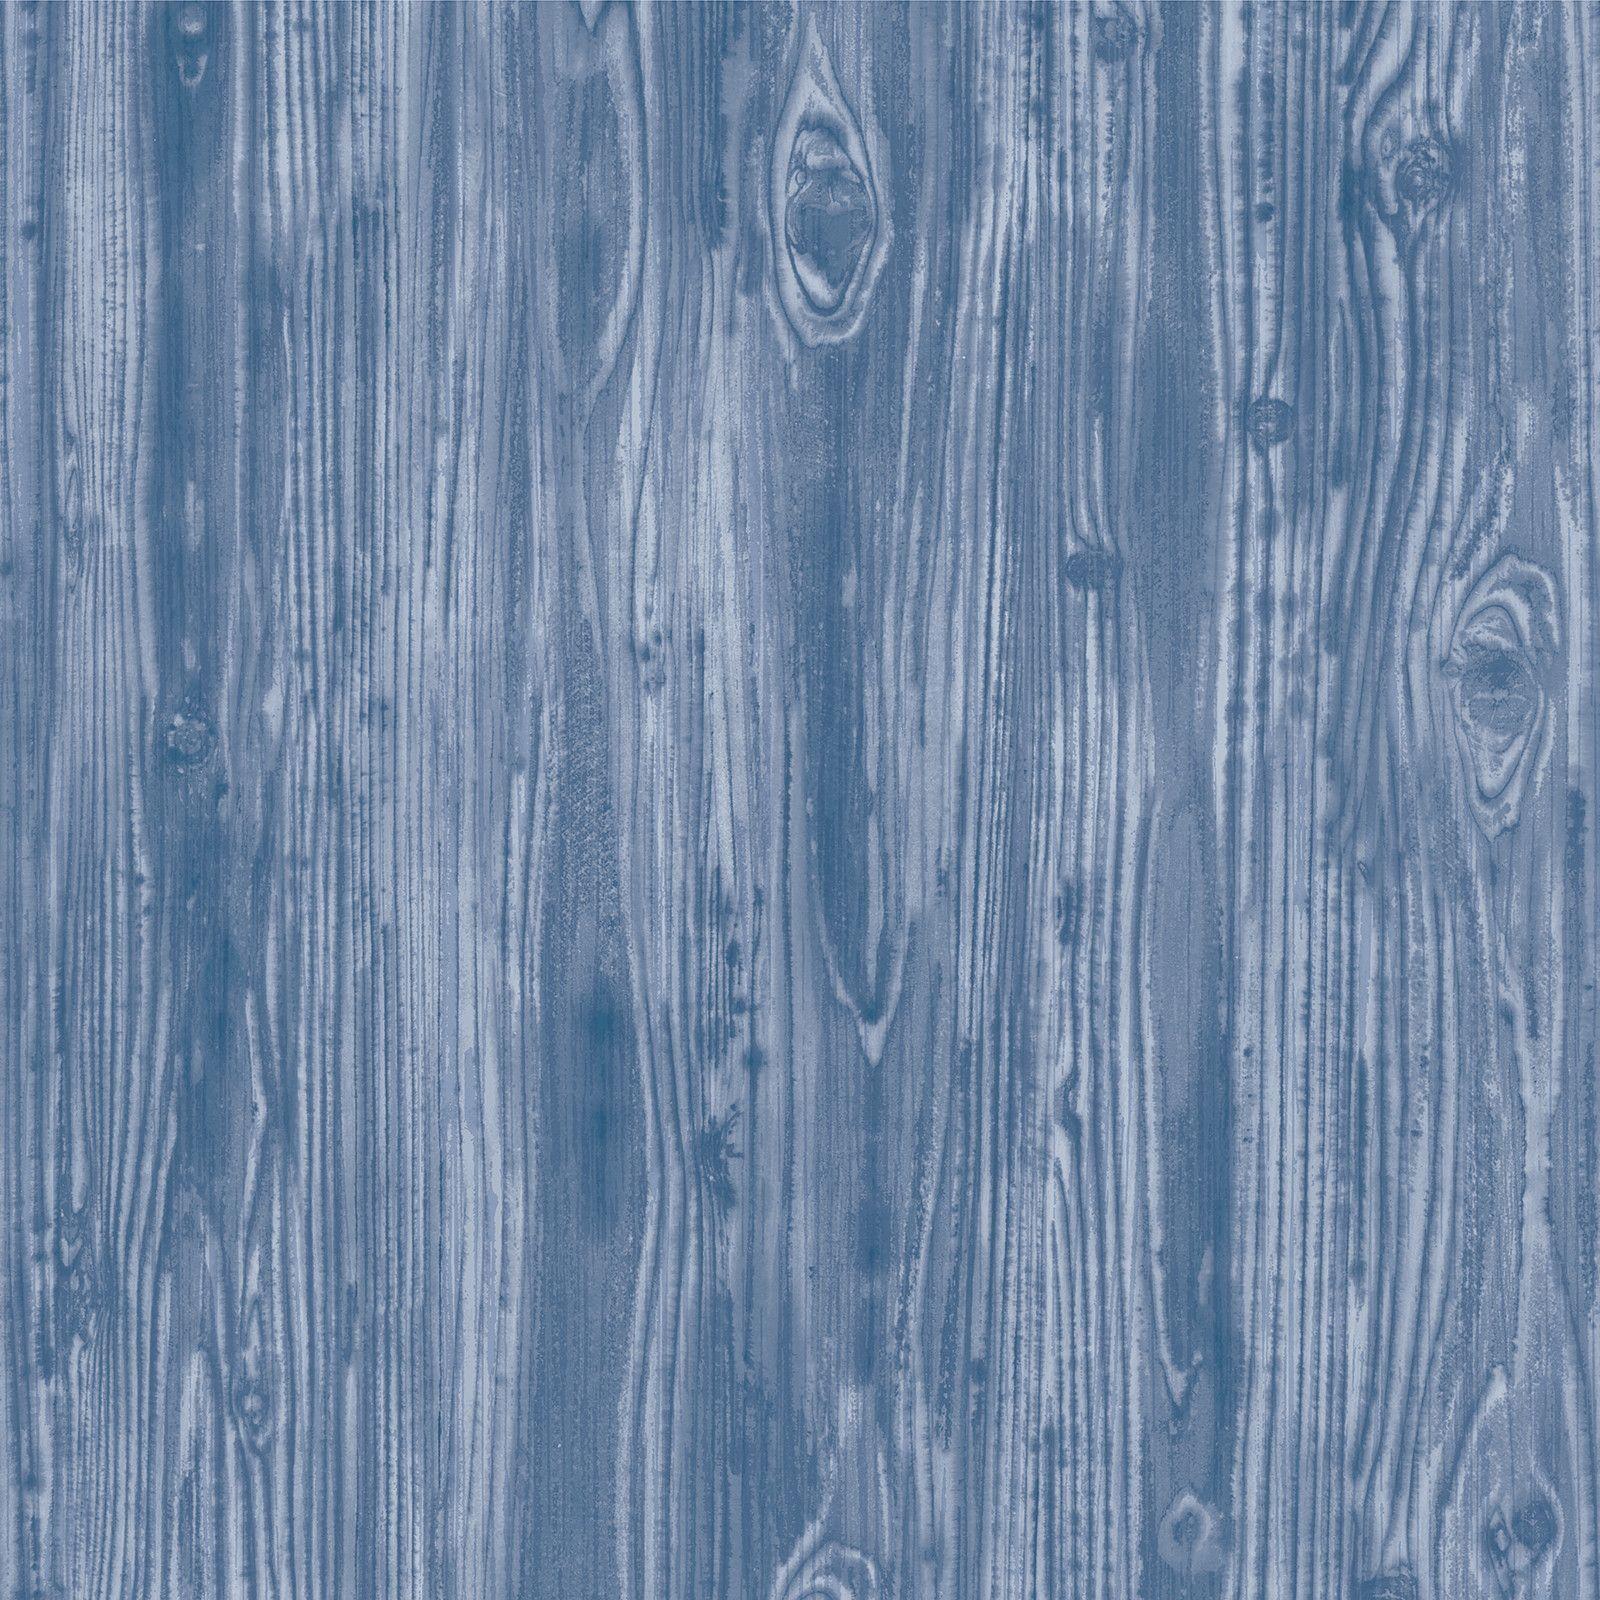 Shop Designer Wallpaper And Modern Designs Self Adhesive WallpaperWood WallpaperTextured